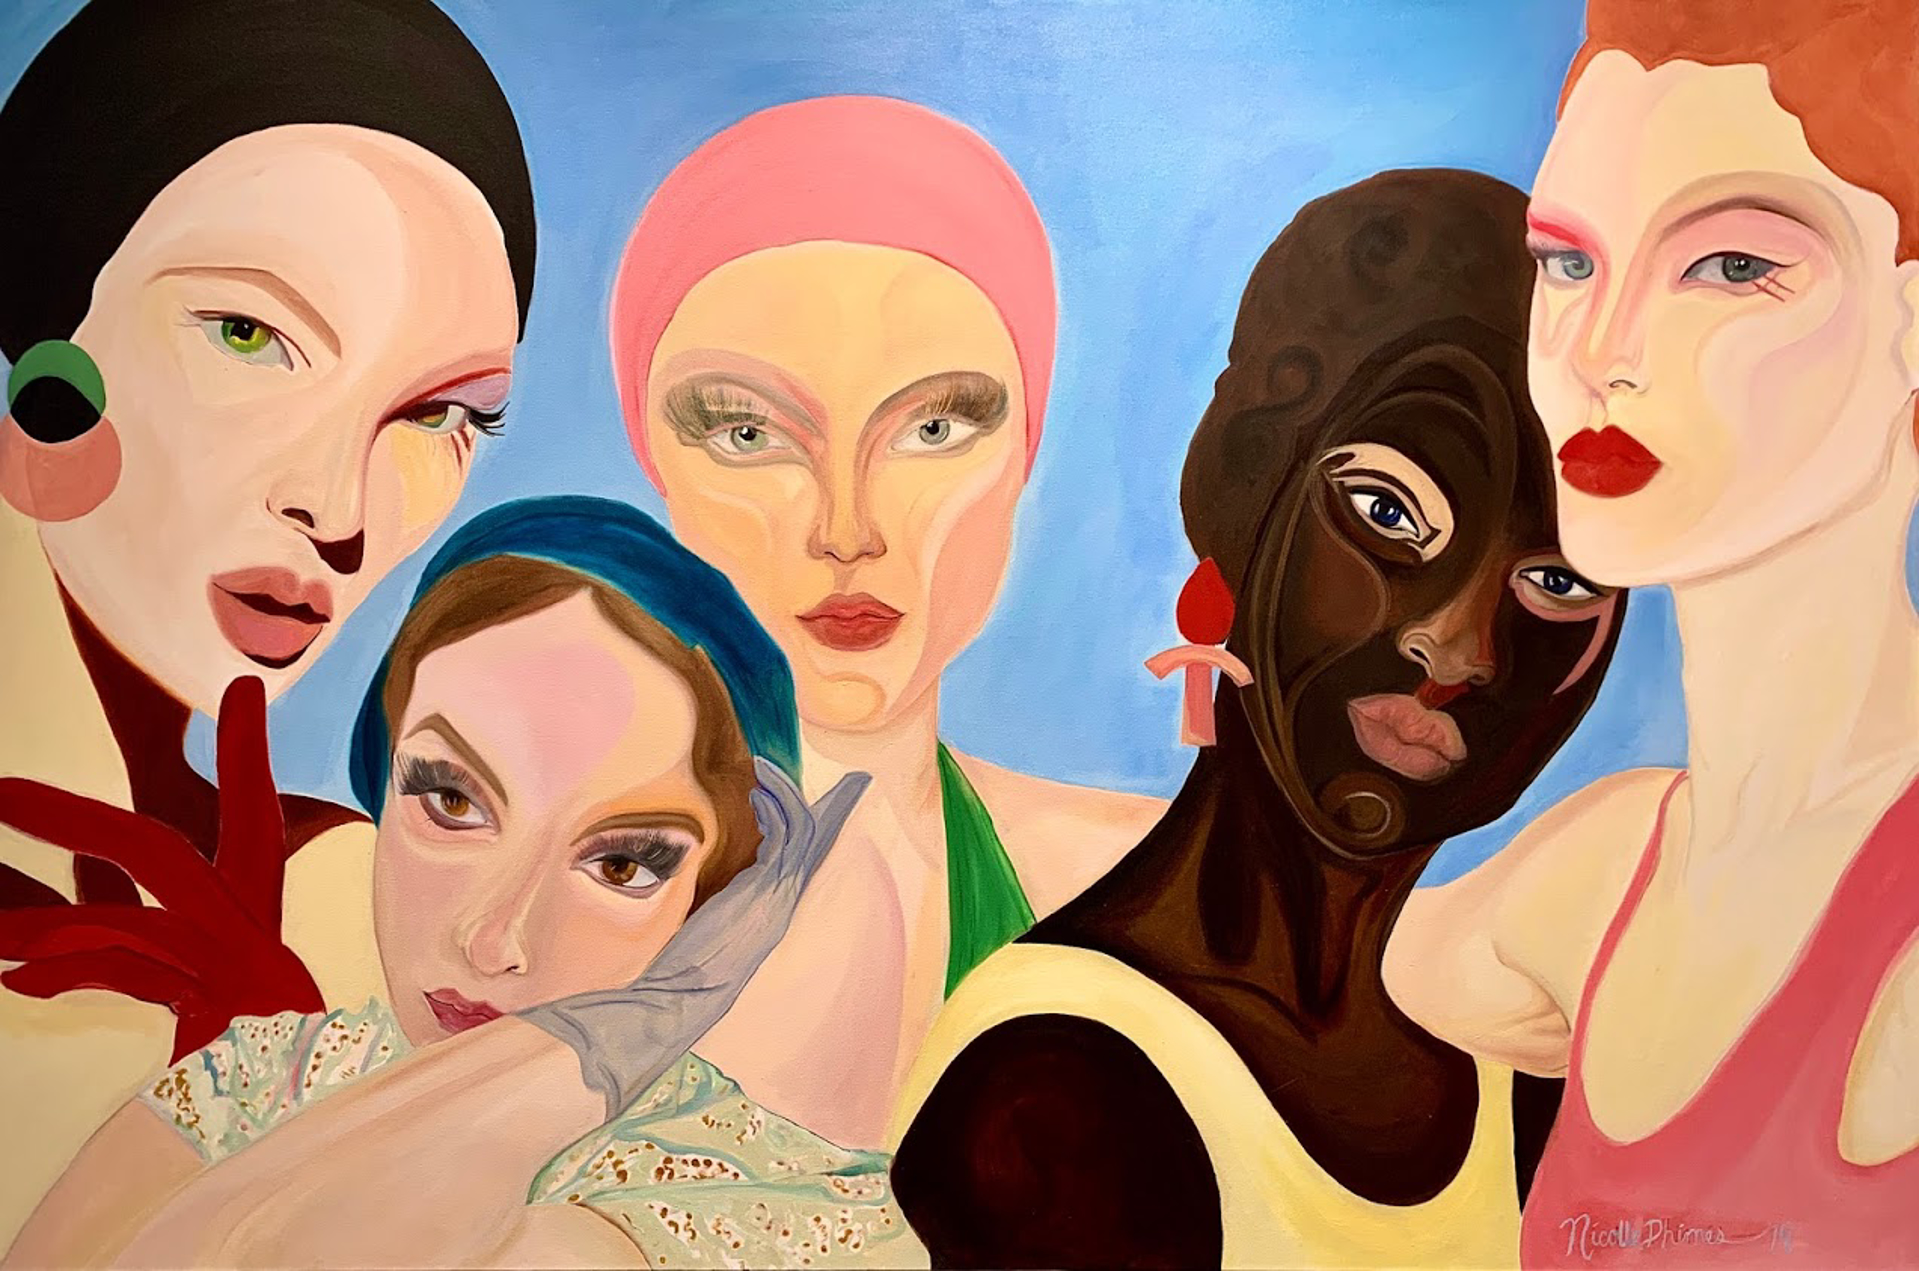 Feminine Purpose by Nicolle Dhimes